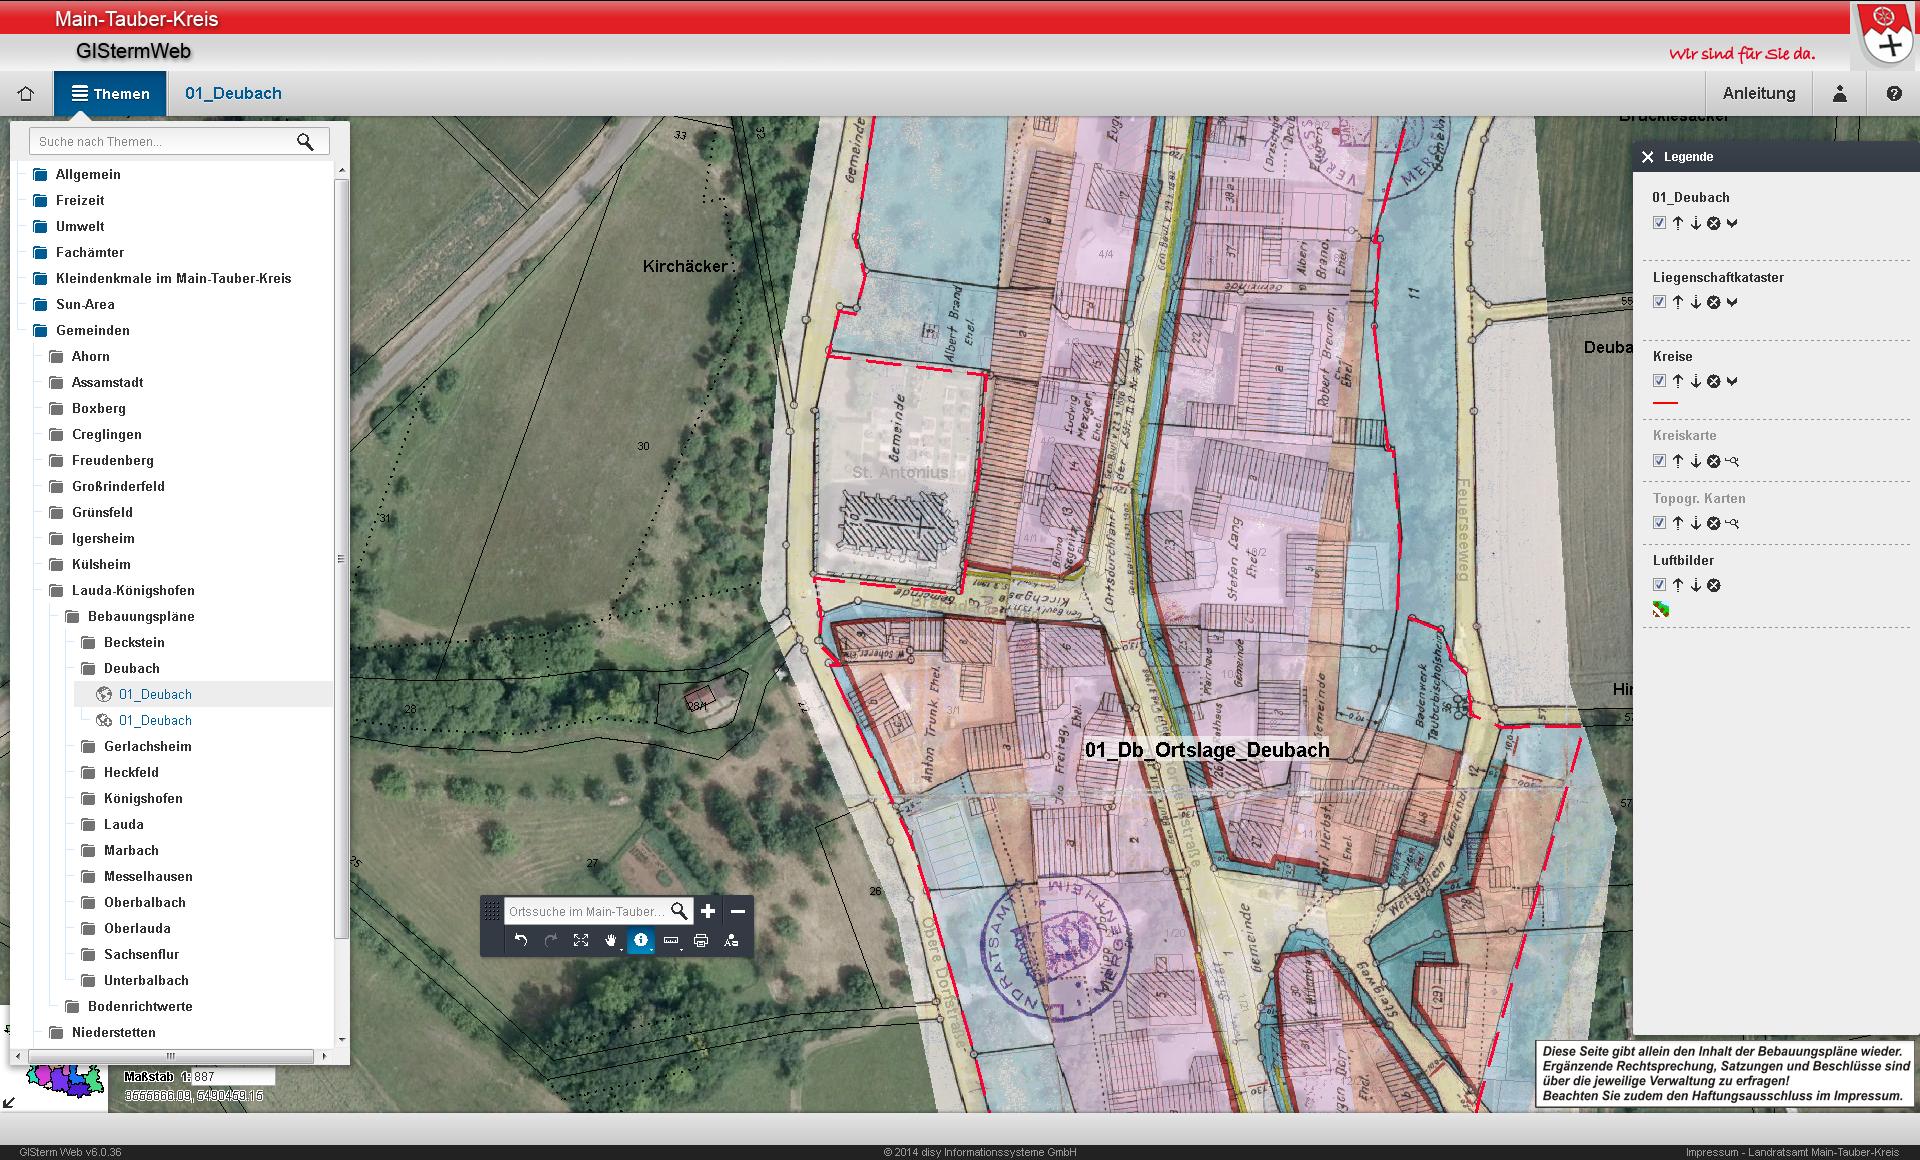 Disy Cadenza Web Buerger GIS Main Tauber Kreis Bebauungsplan